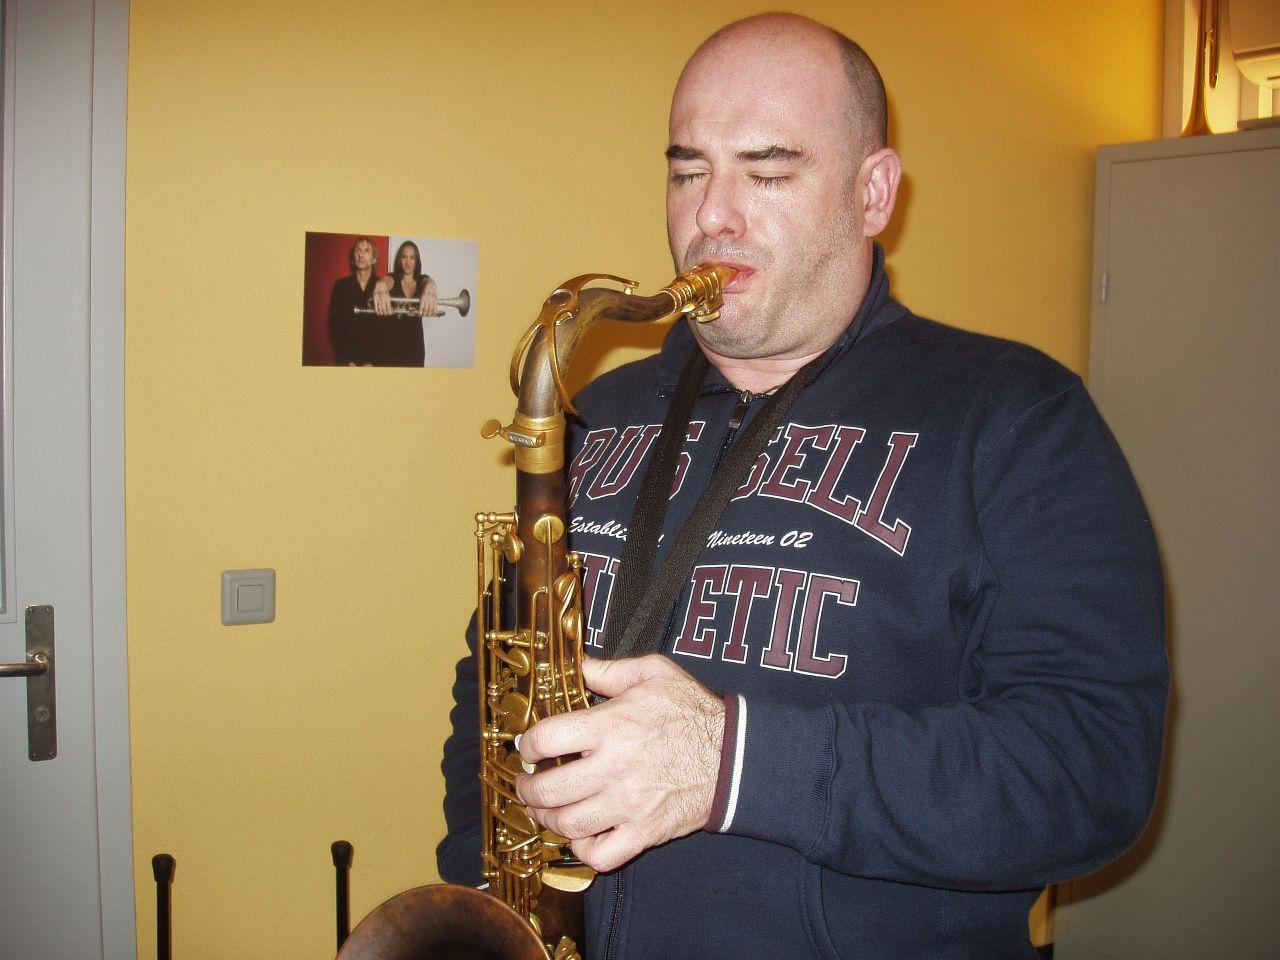 Musiker 112